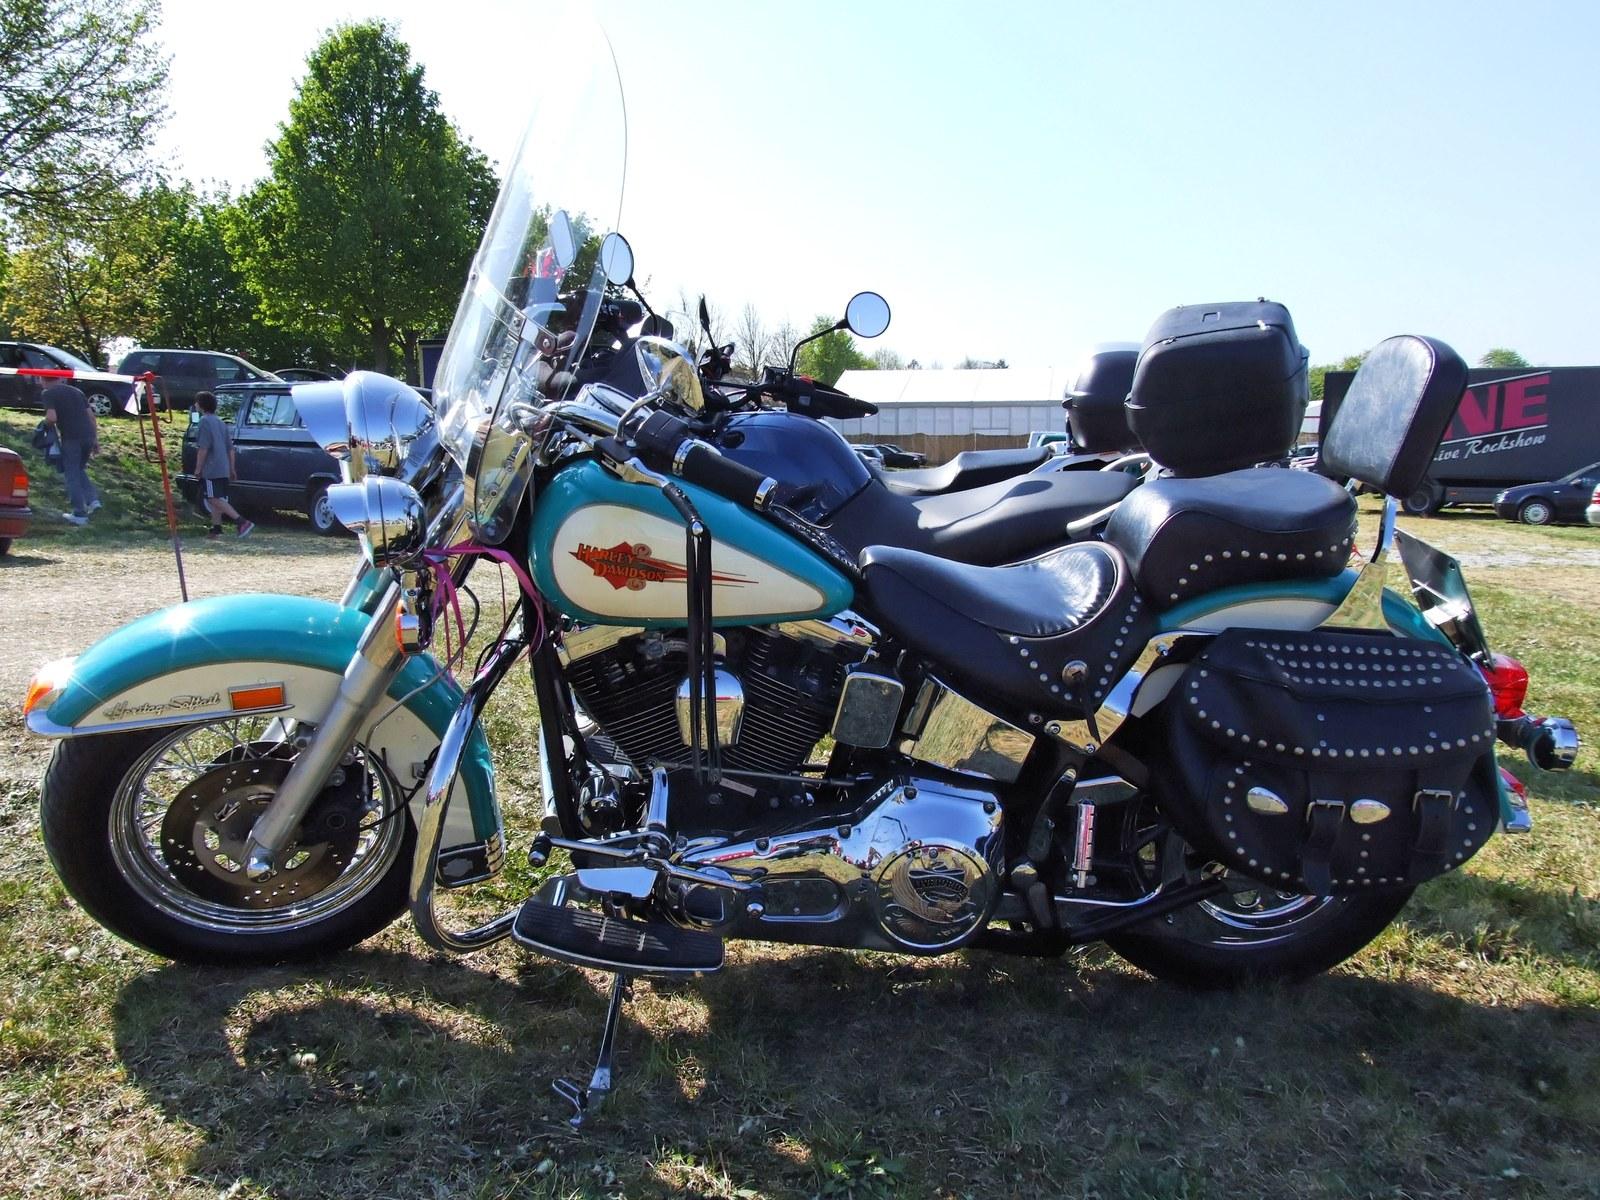 Harley Davidson Softail Breakout For Sale Uk